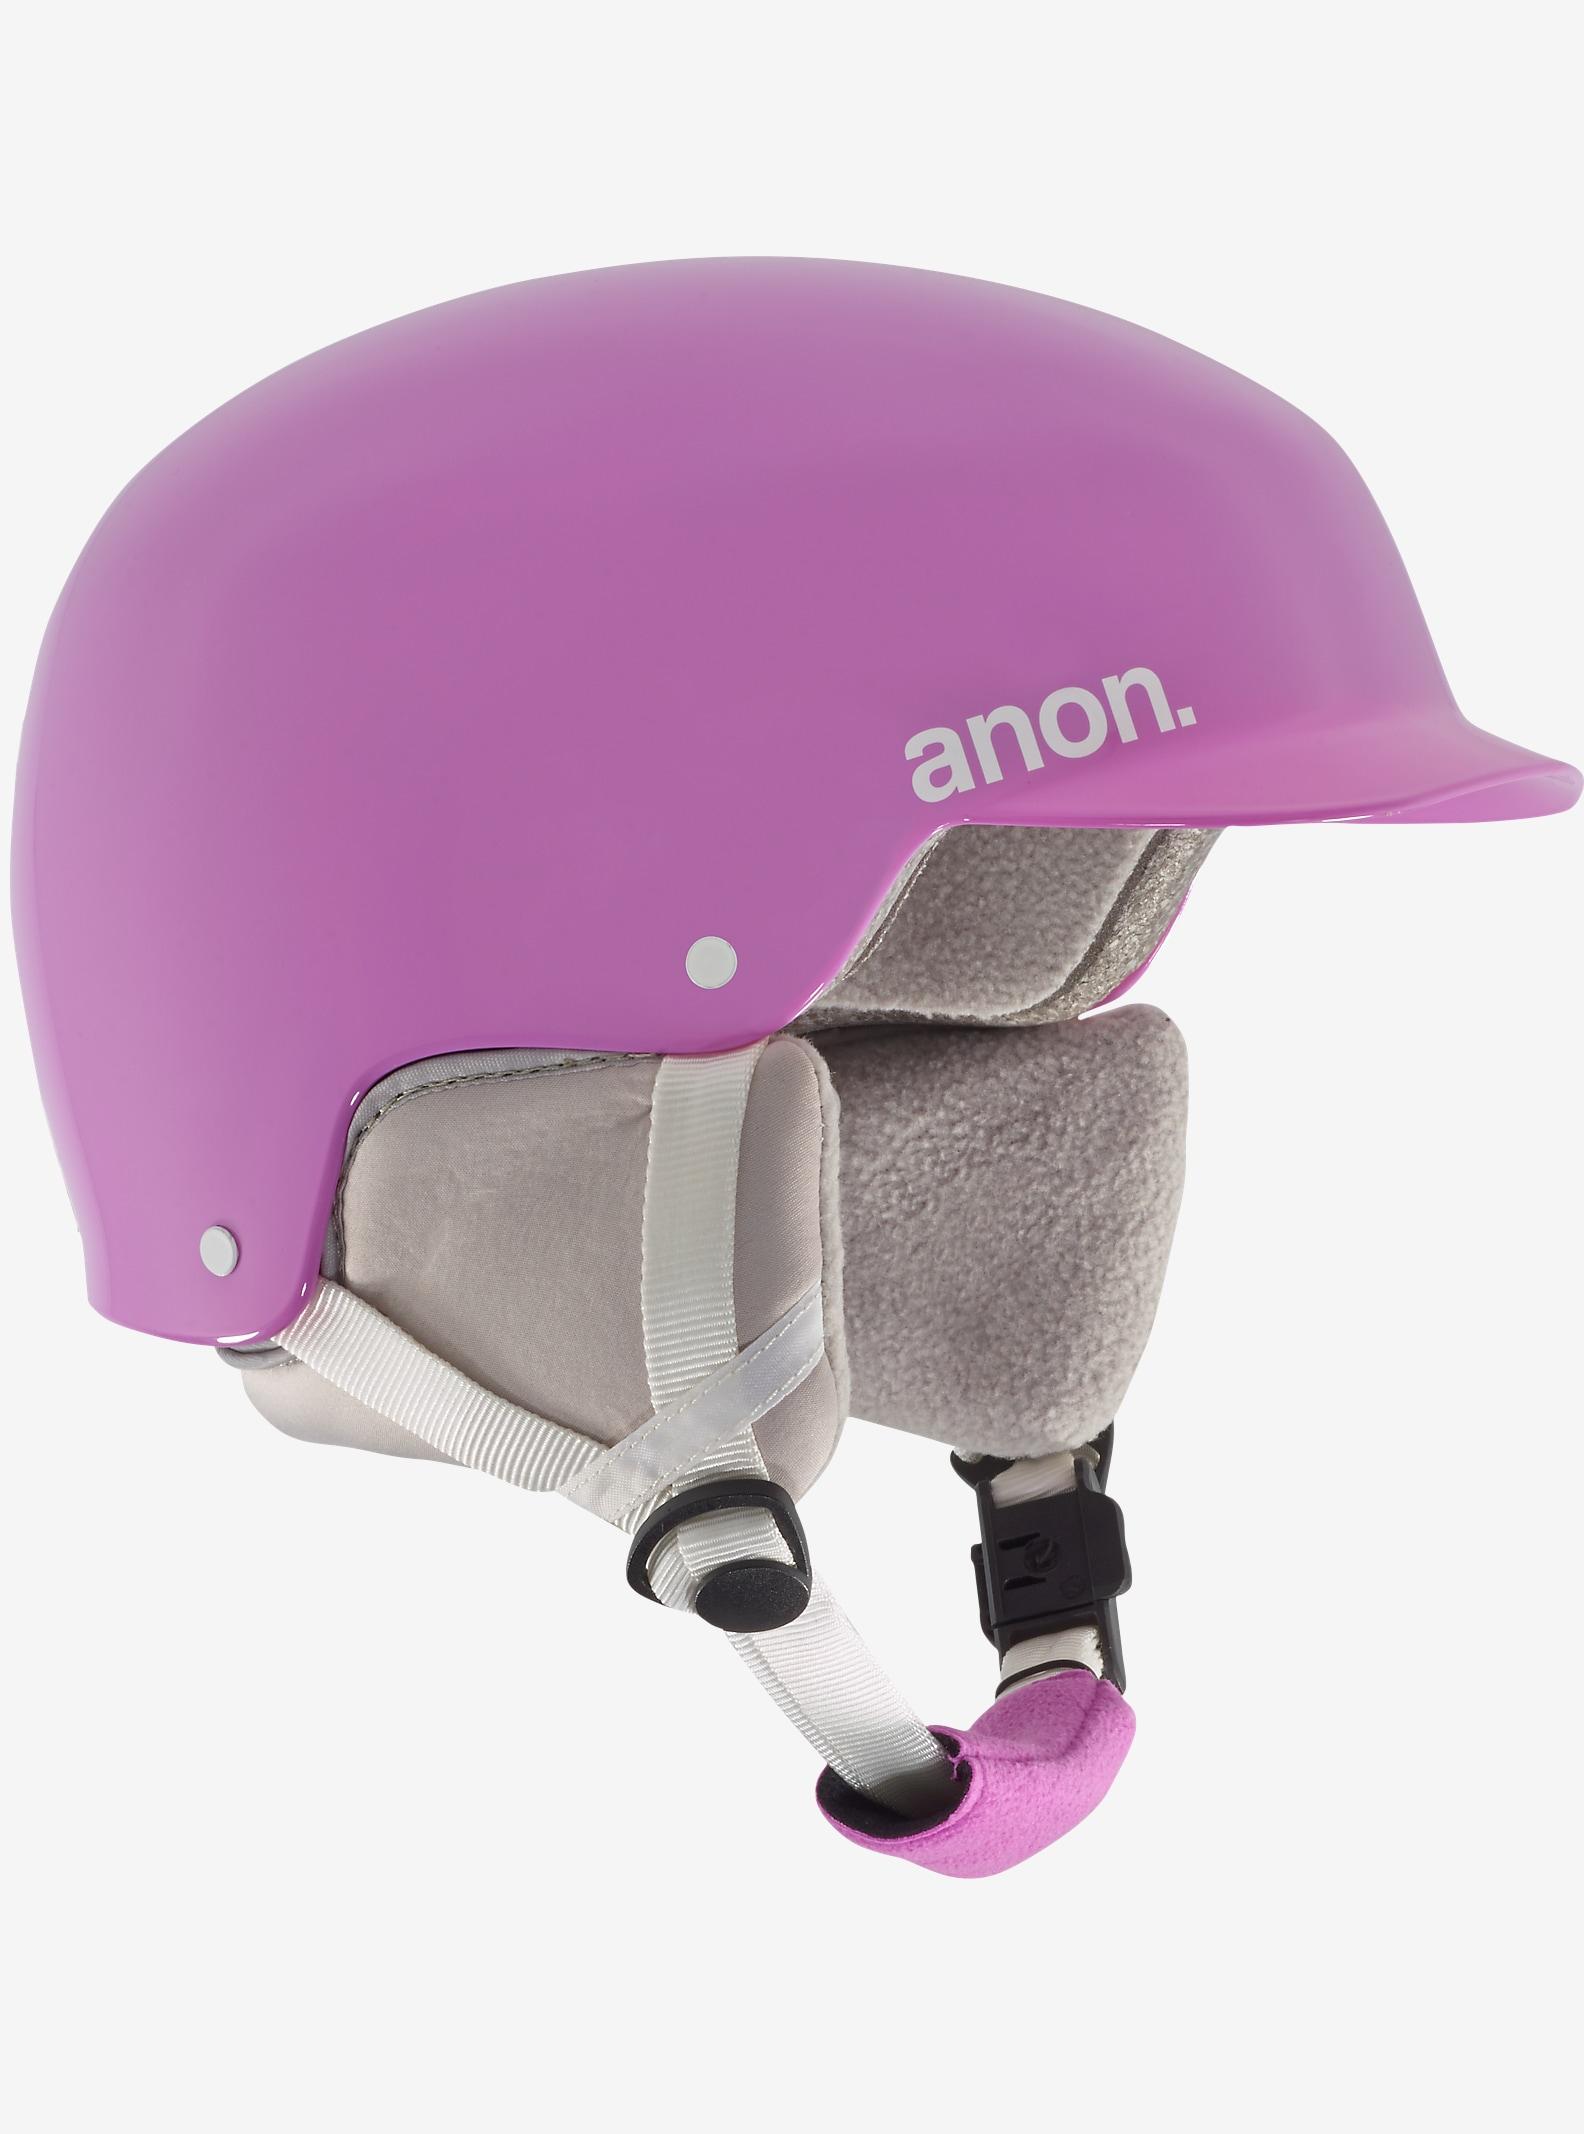 anon. Girls' Scout Helmet shown in Farie Pink